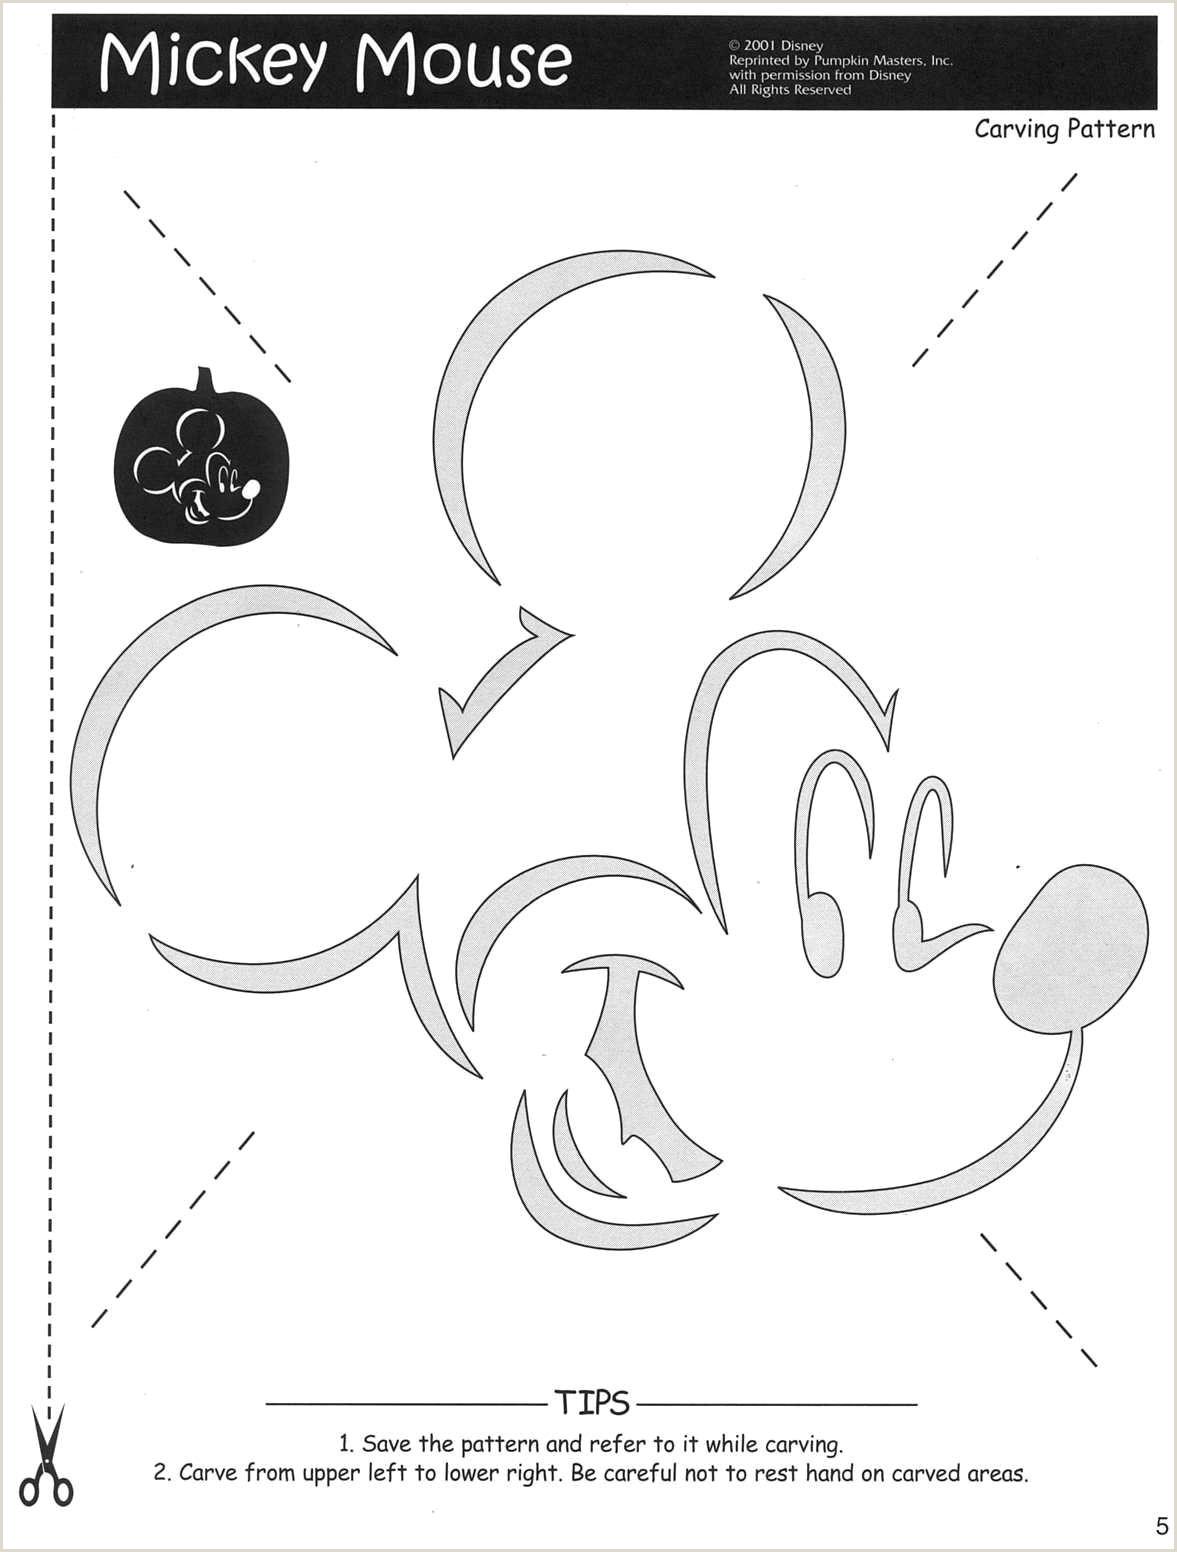 Minnie Mouse Carving Template Pin Od Použvateľa Len či Zlatičko Na Nástenke Tekvice